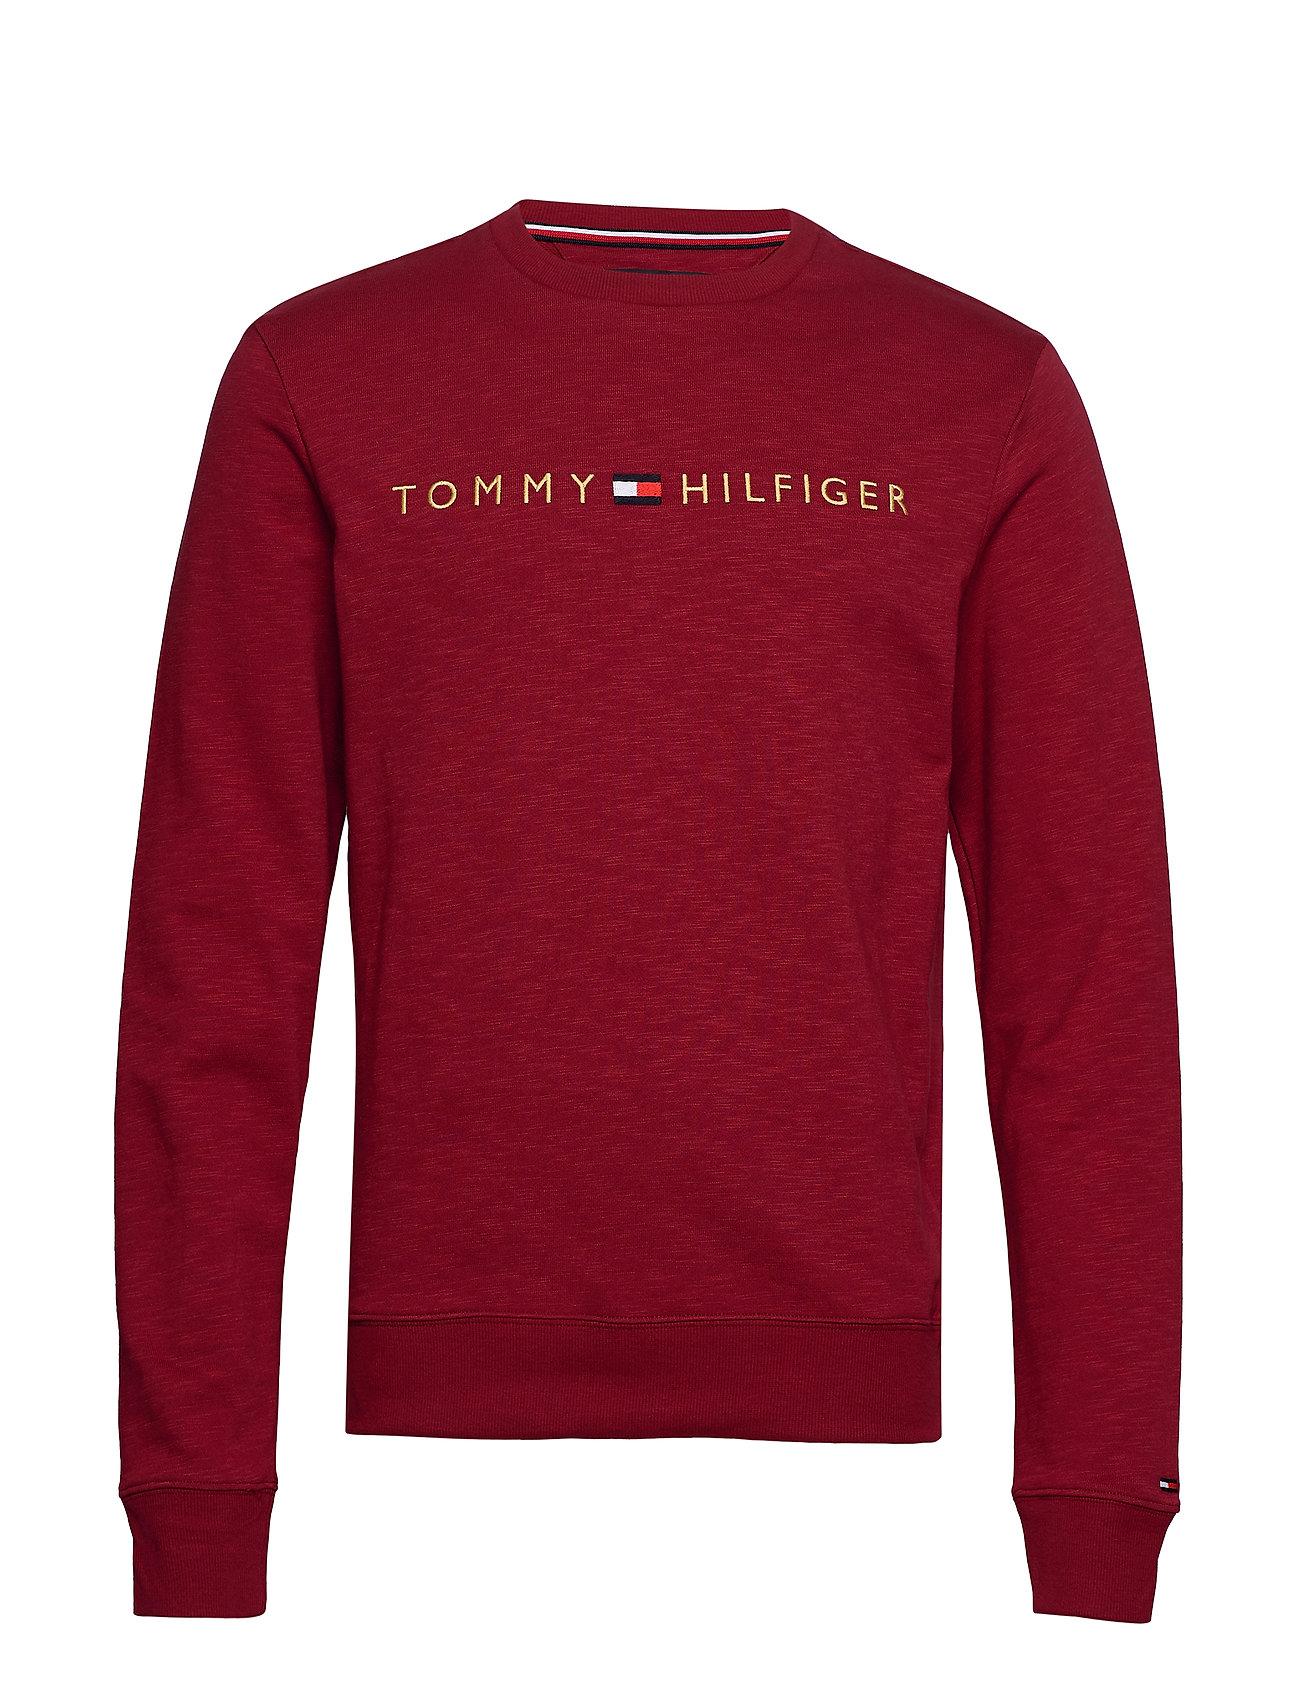 Tommy Hilfiger TRACK TOP LS HWK - RHUBARB